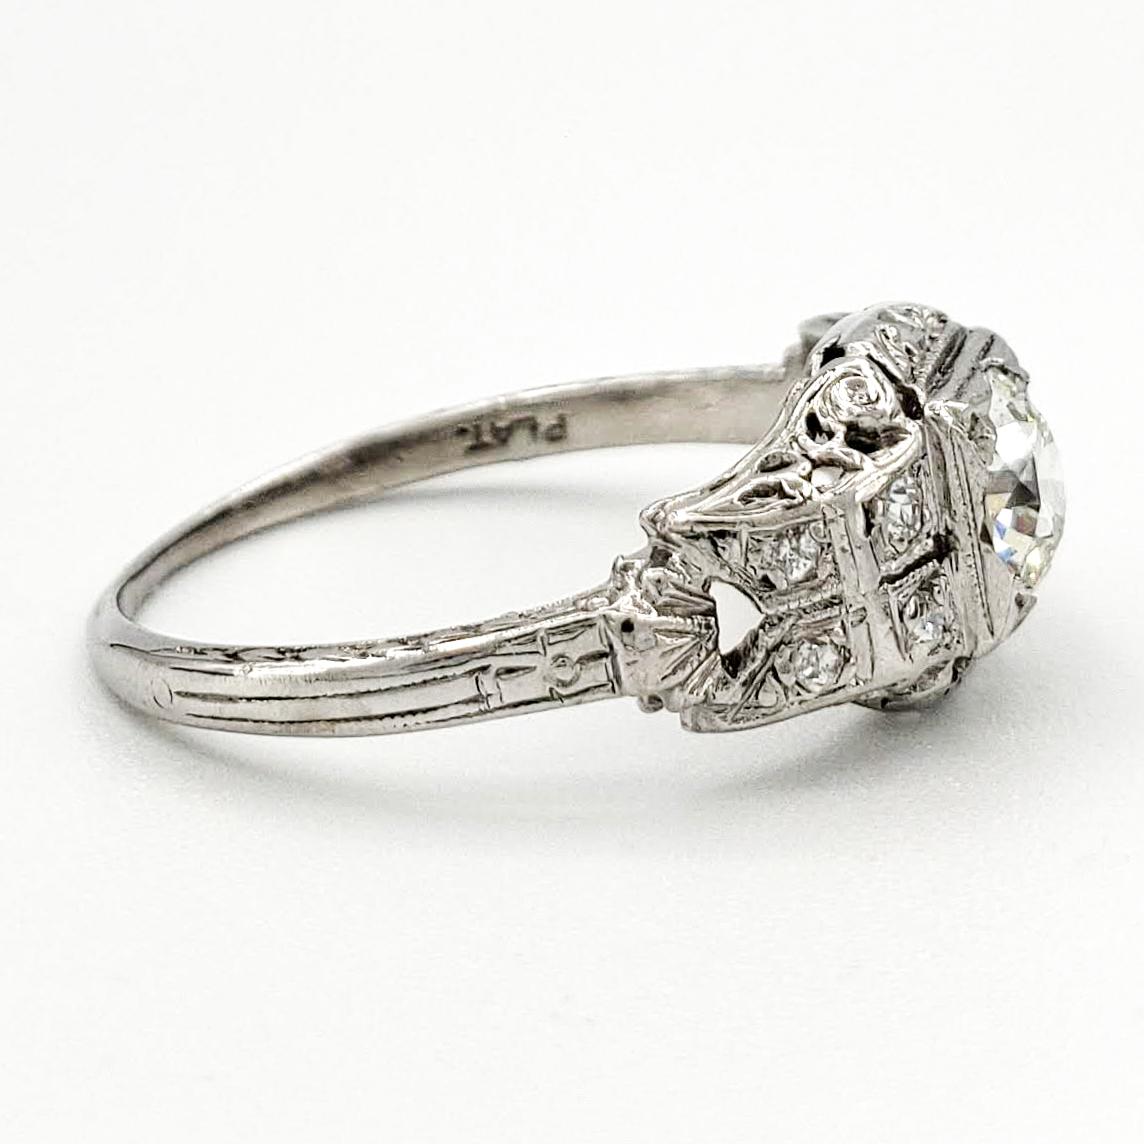 vintage-platinum-engagement-ring-with-0-32-carat-old-european-cut-diamond-egl-h-vs2